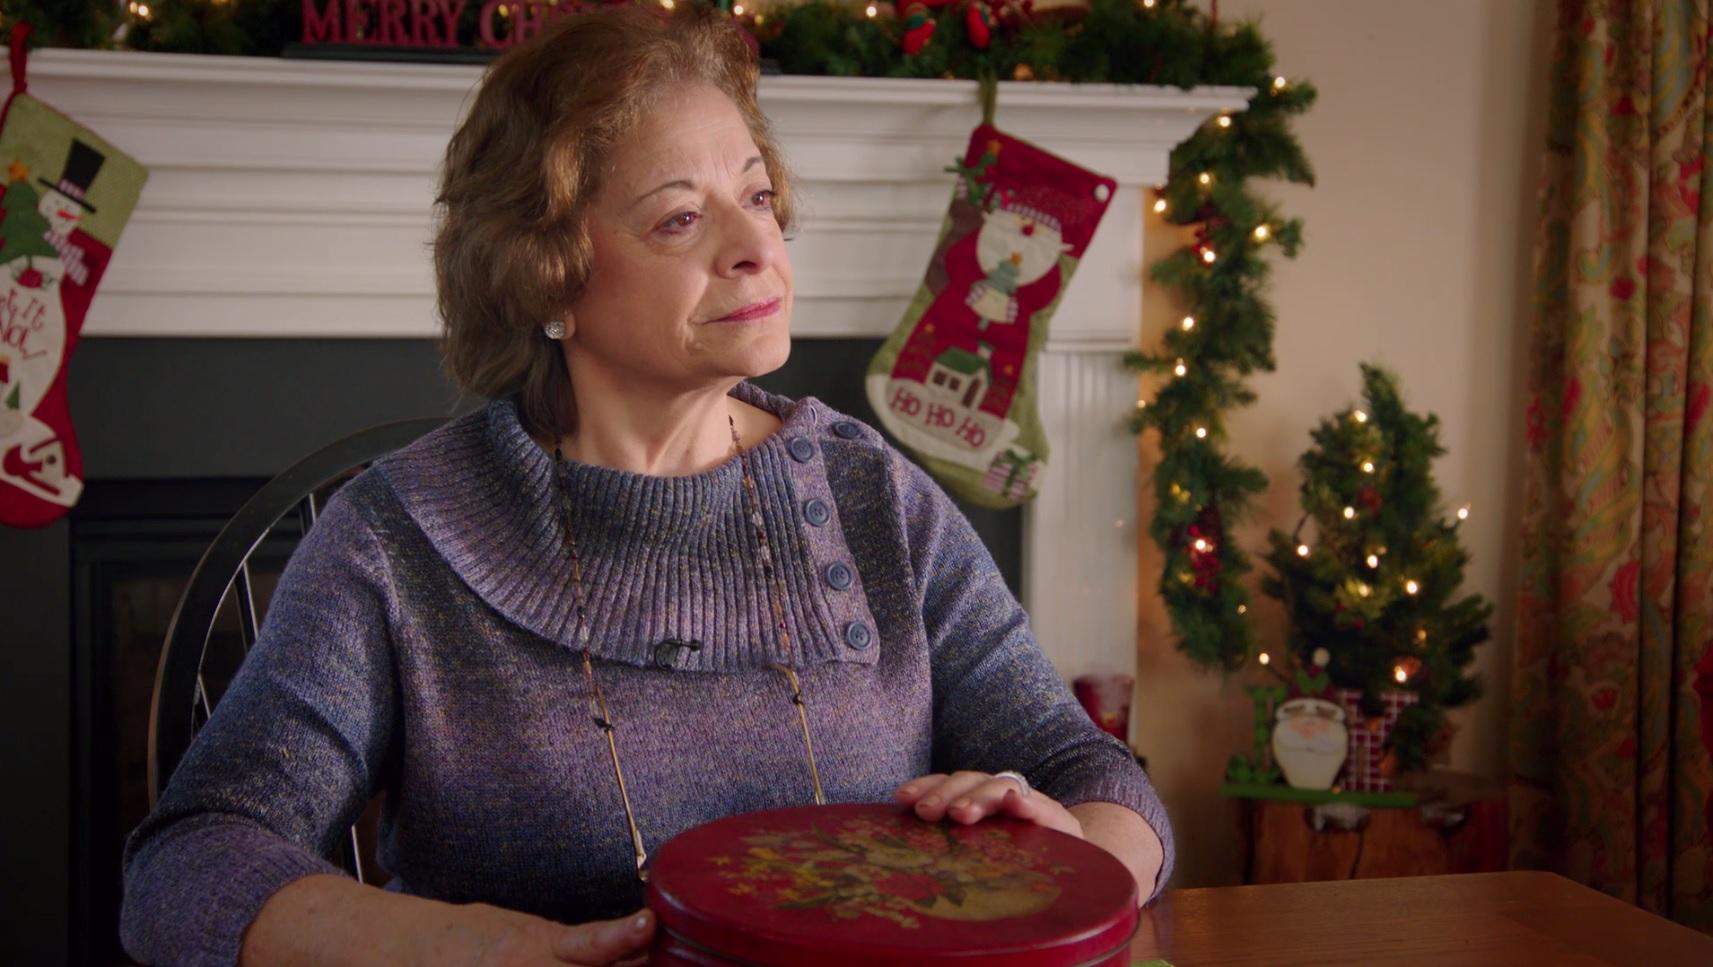 Susan Shalhoub Larkin Steals The Fruitcake In Topher Payne's 'Broadcasting Christmas'